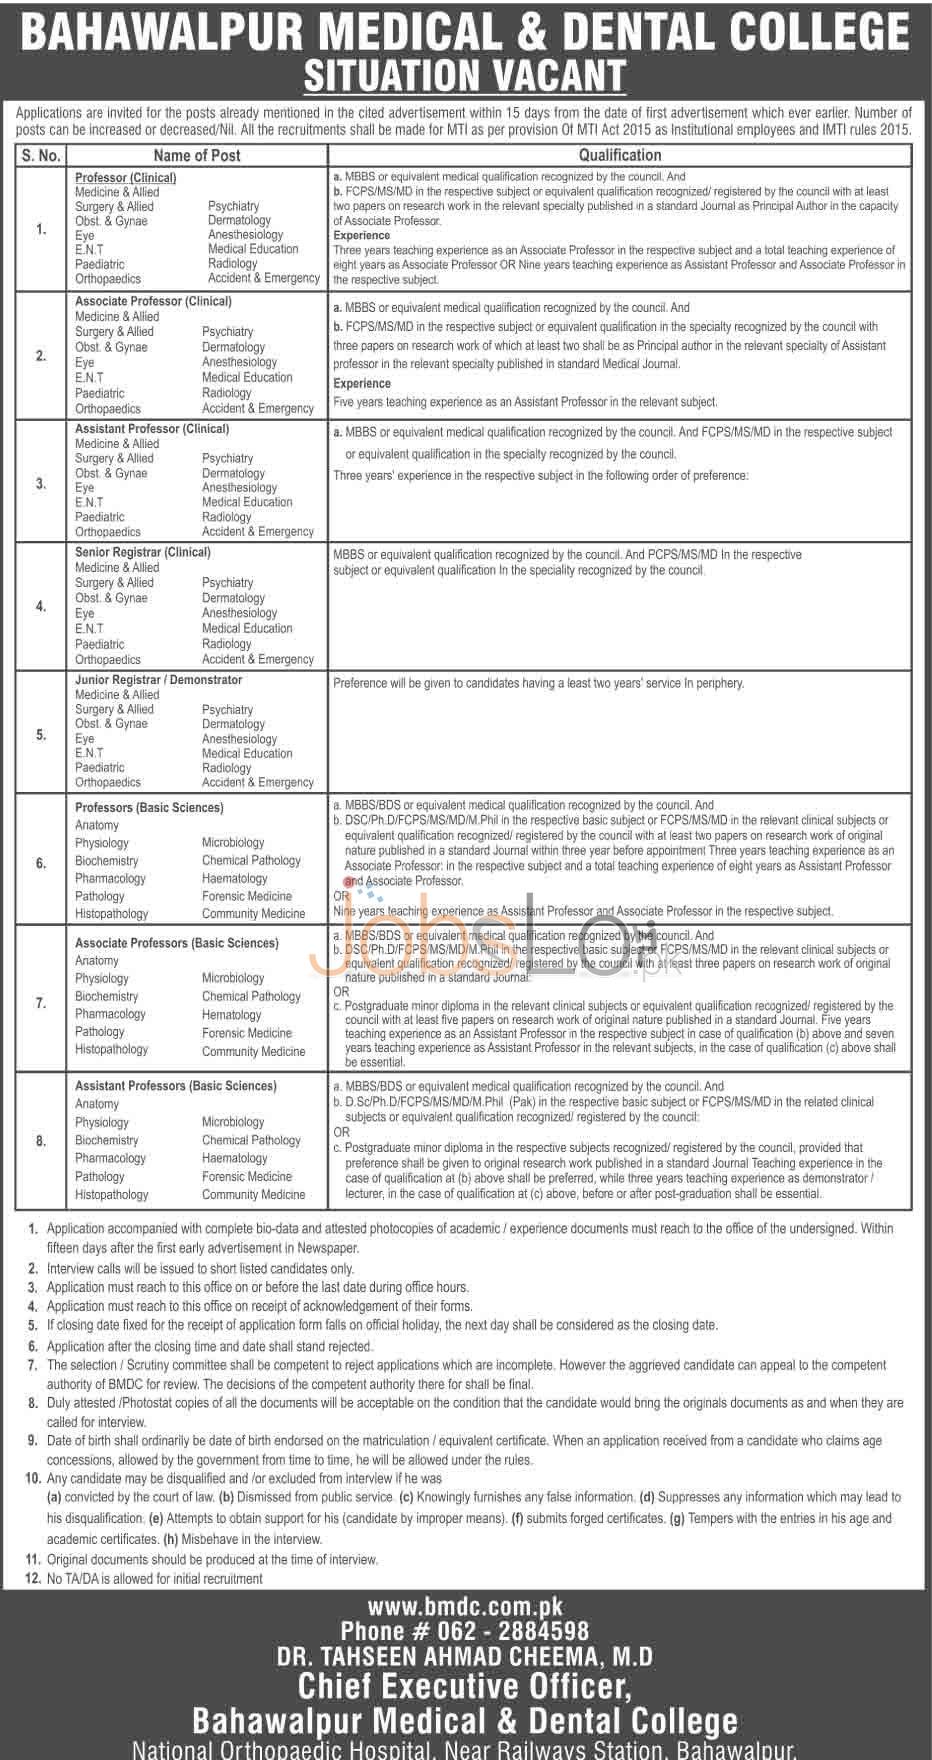 Recruitment Opportunities in Bahawalpur Medical & Dental College 2016 For Professor, Asst Professor & Sr Registrar Eligibility Criteria